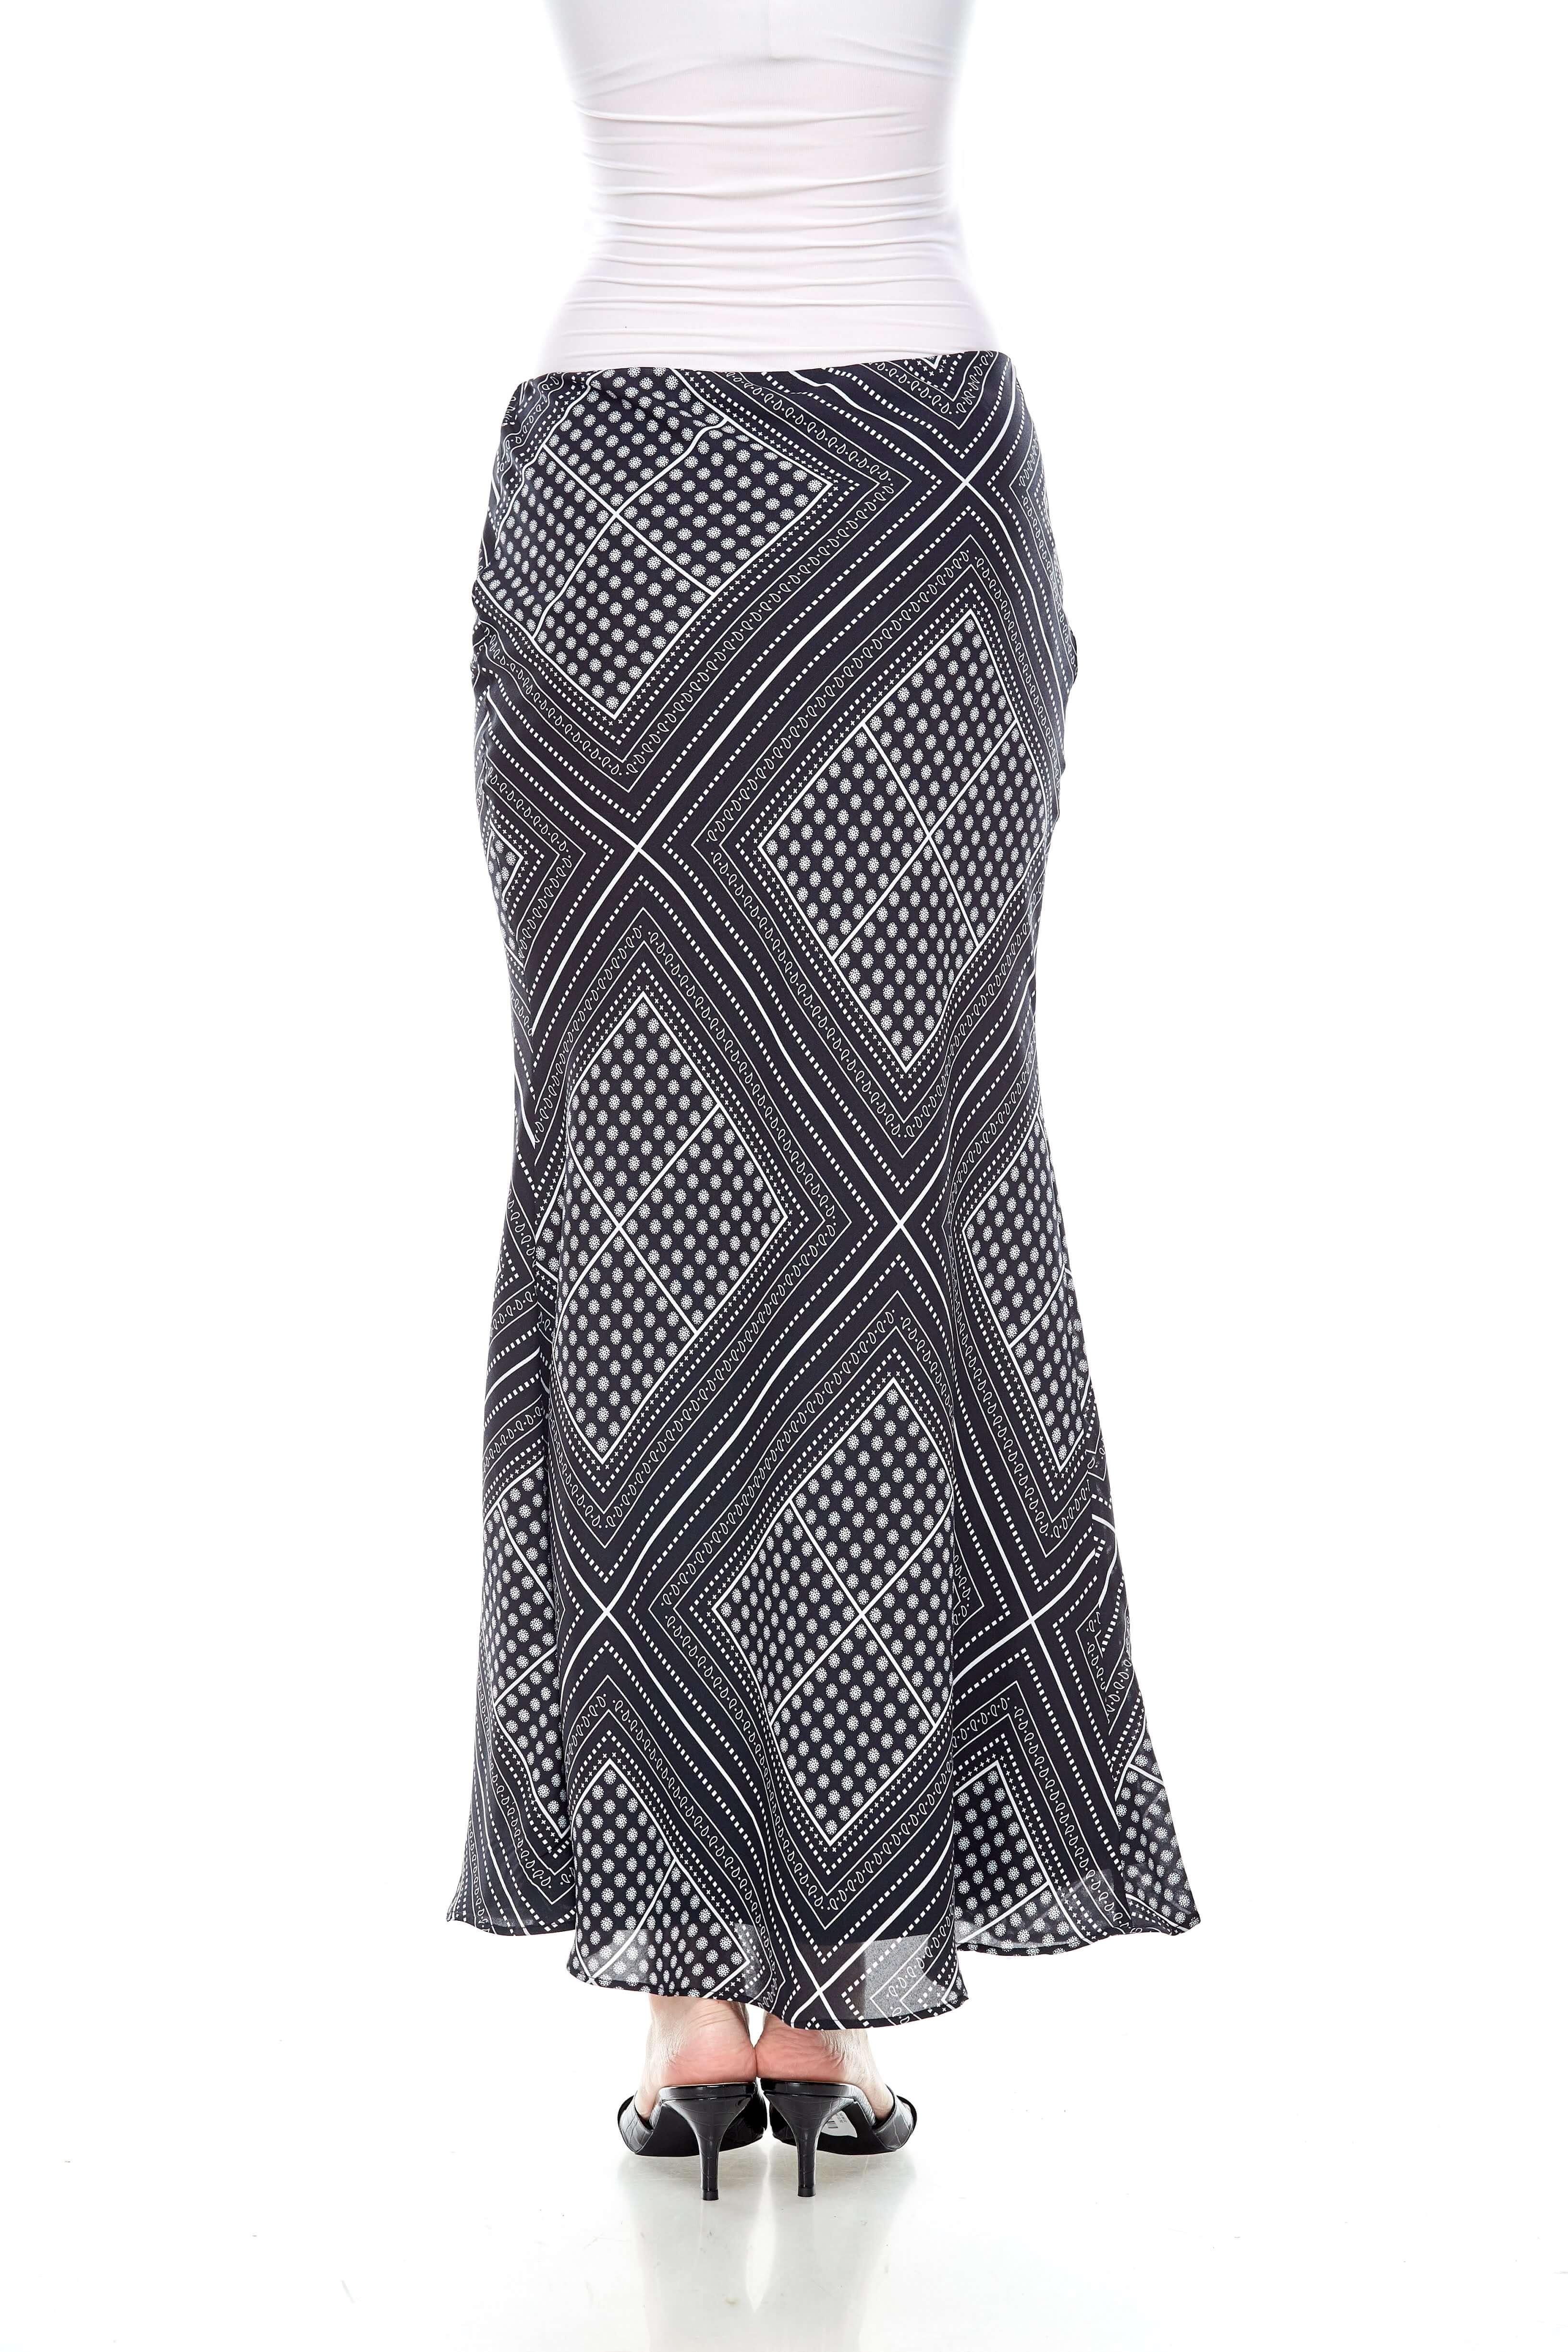 Black Handkerchief Print Mermaid Skirt (5)